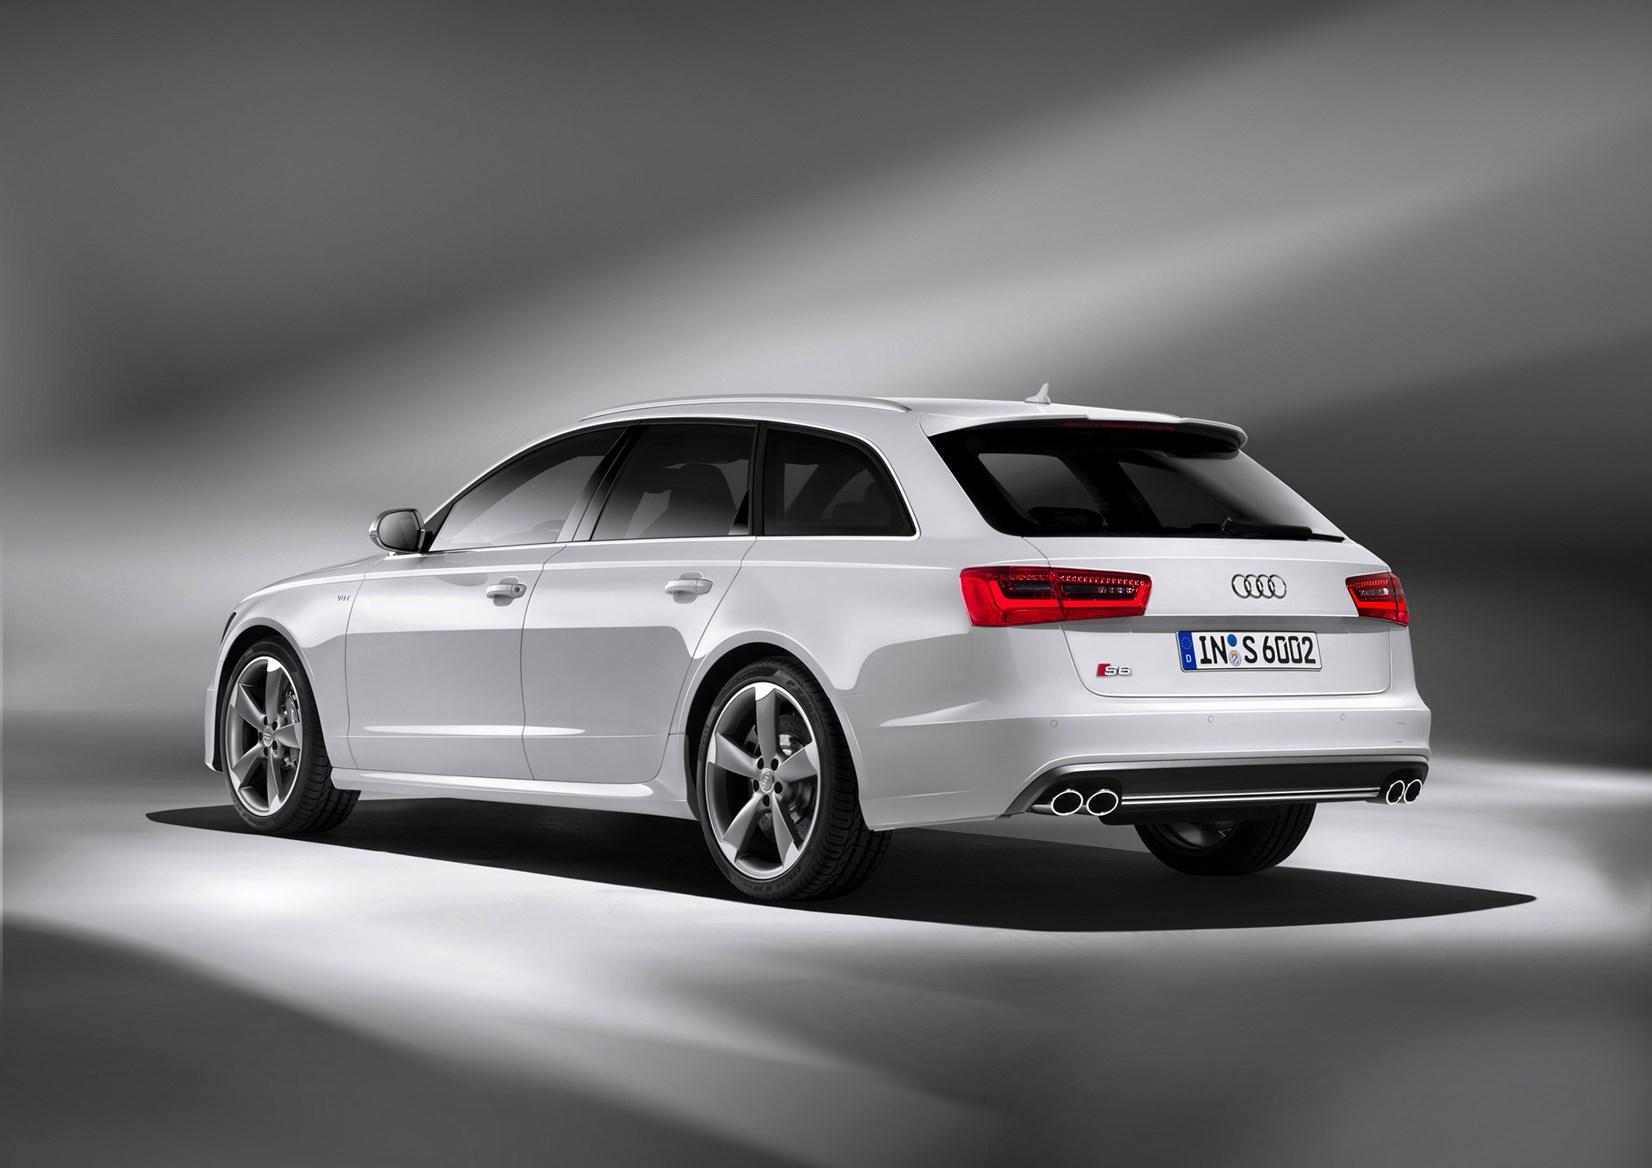 Audi A6 S6 Review 2012